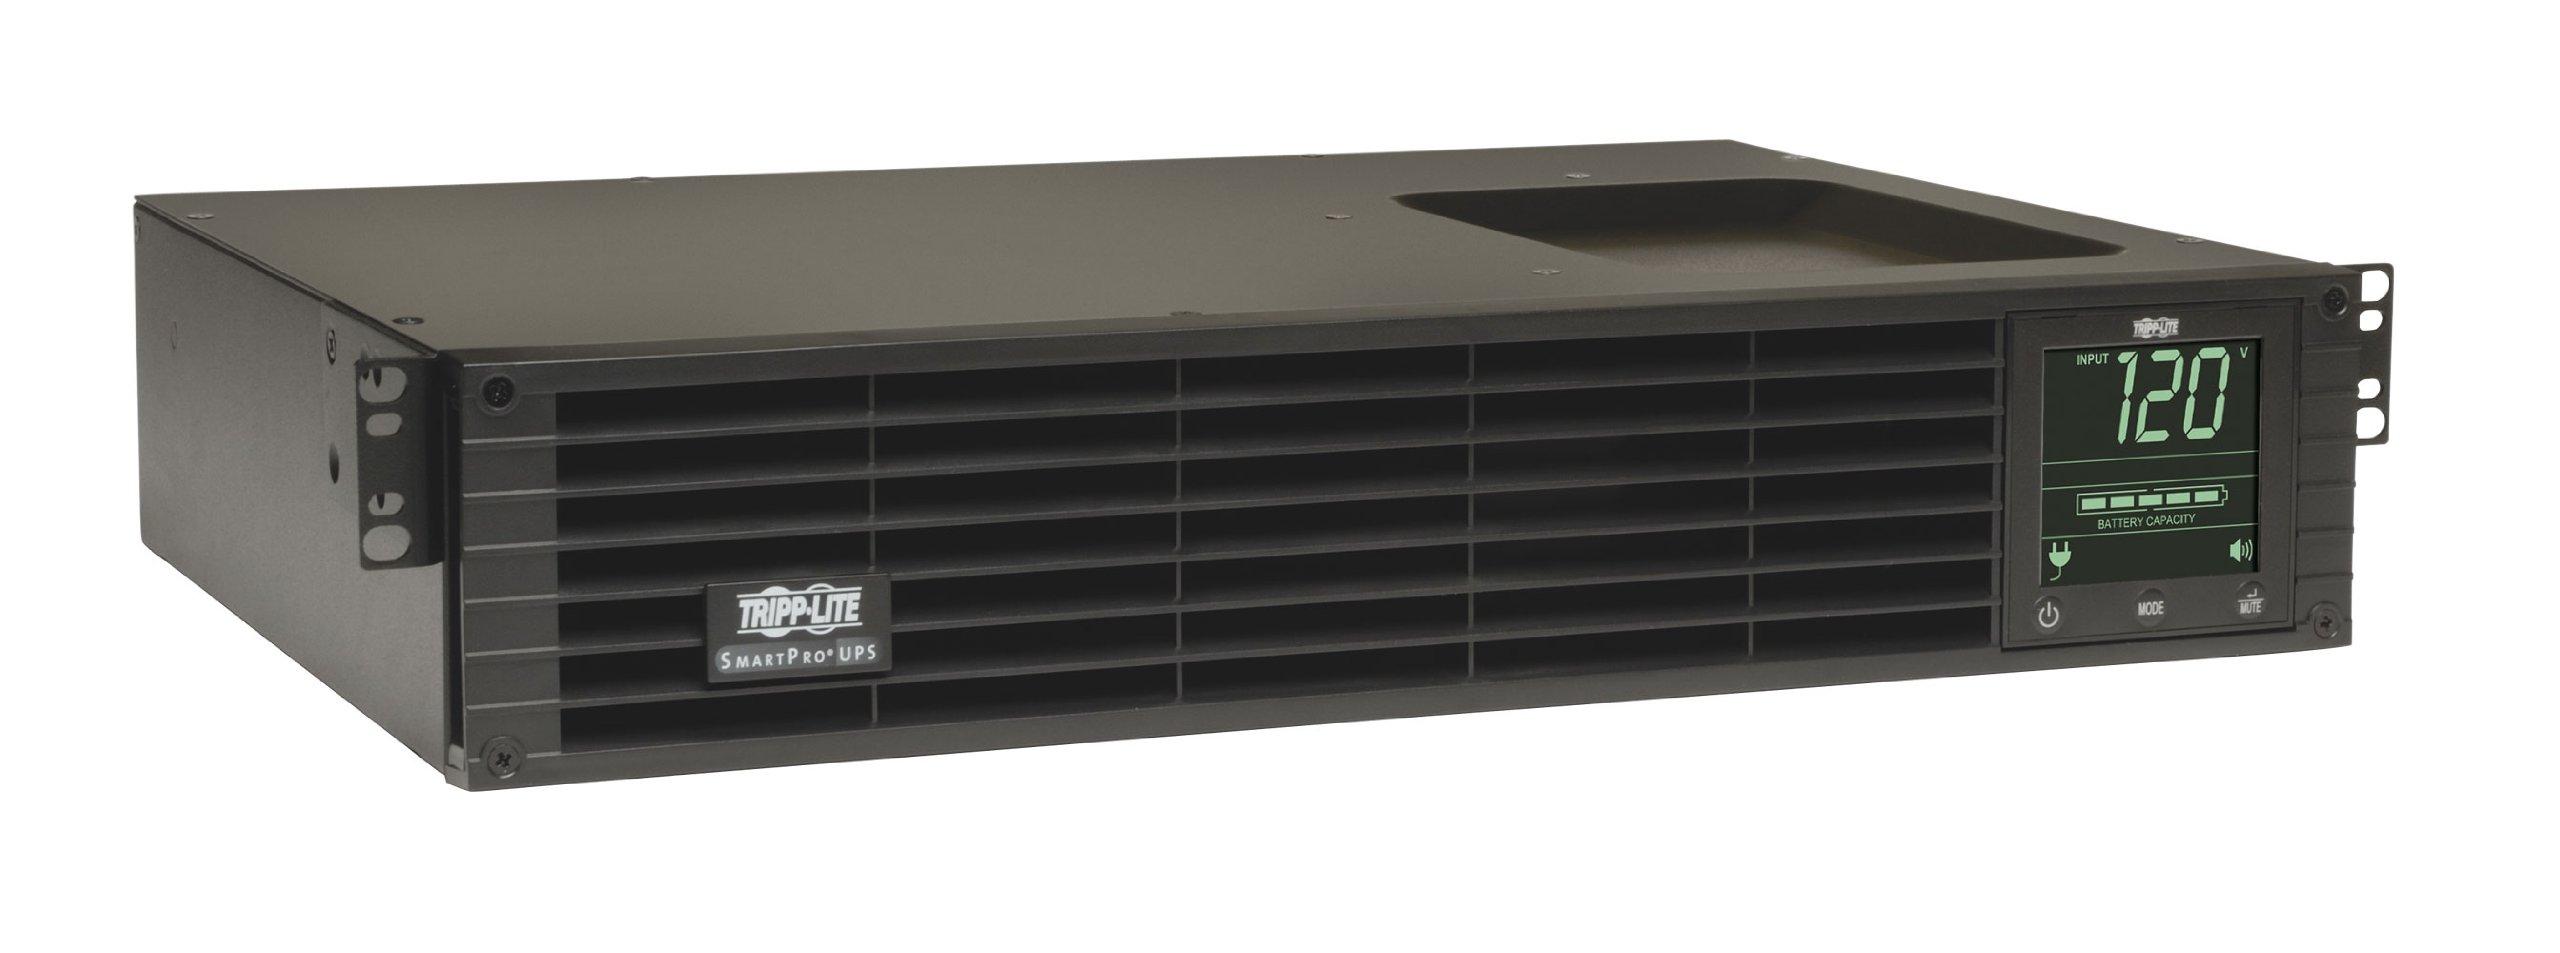 Tripp Lite 1500VA Smart UPS Back Up, Sine Wave, 1350W Line-Interactive, 2U Rackmount, Extended Run Option, LCD, USB, DB9 (SMART1500RMXL2UA)